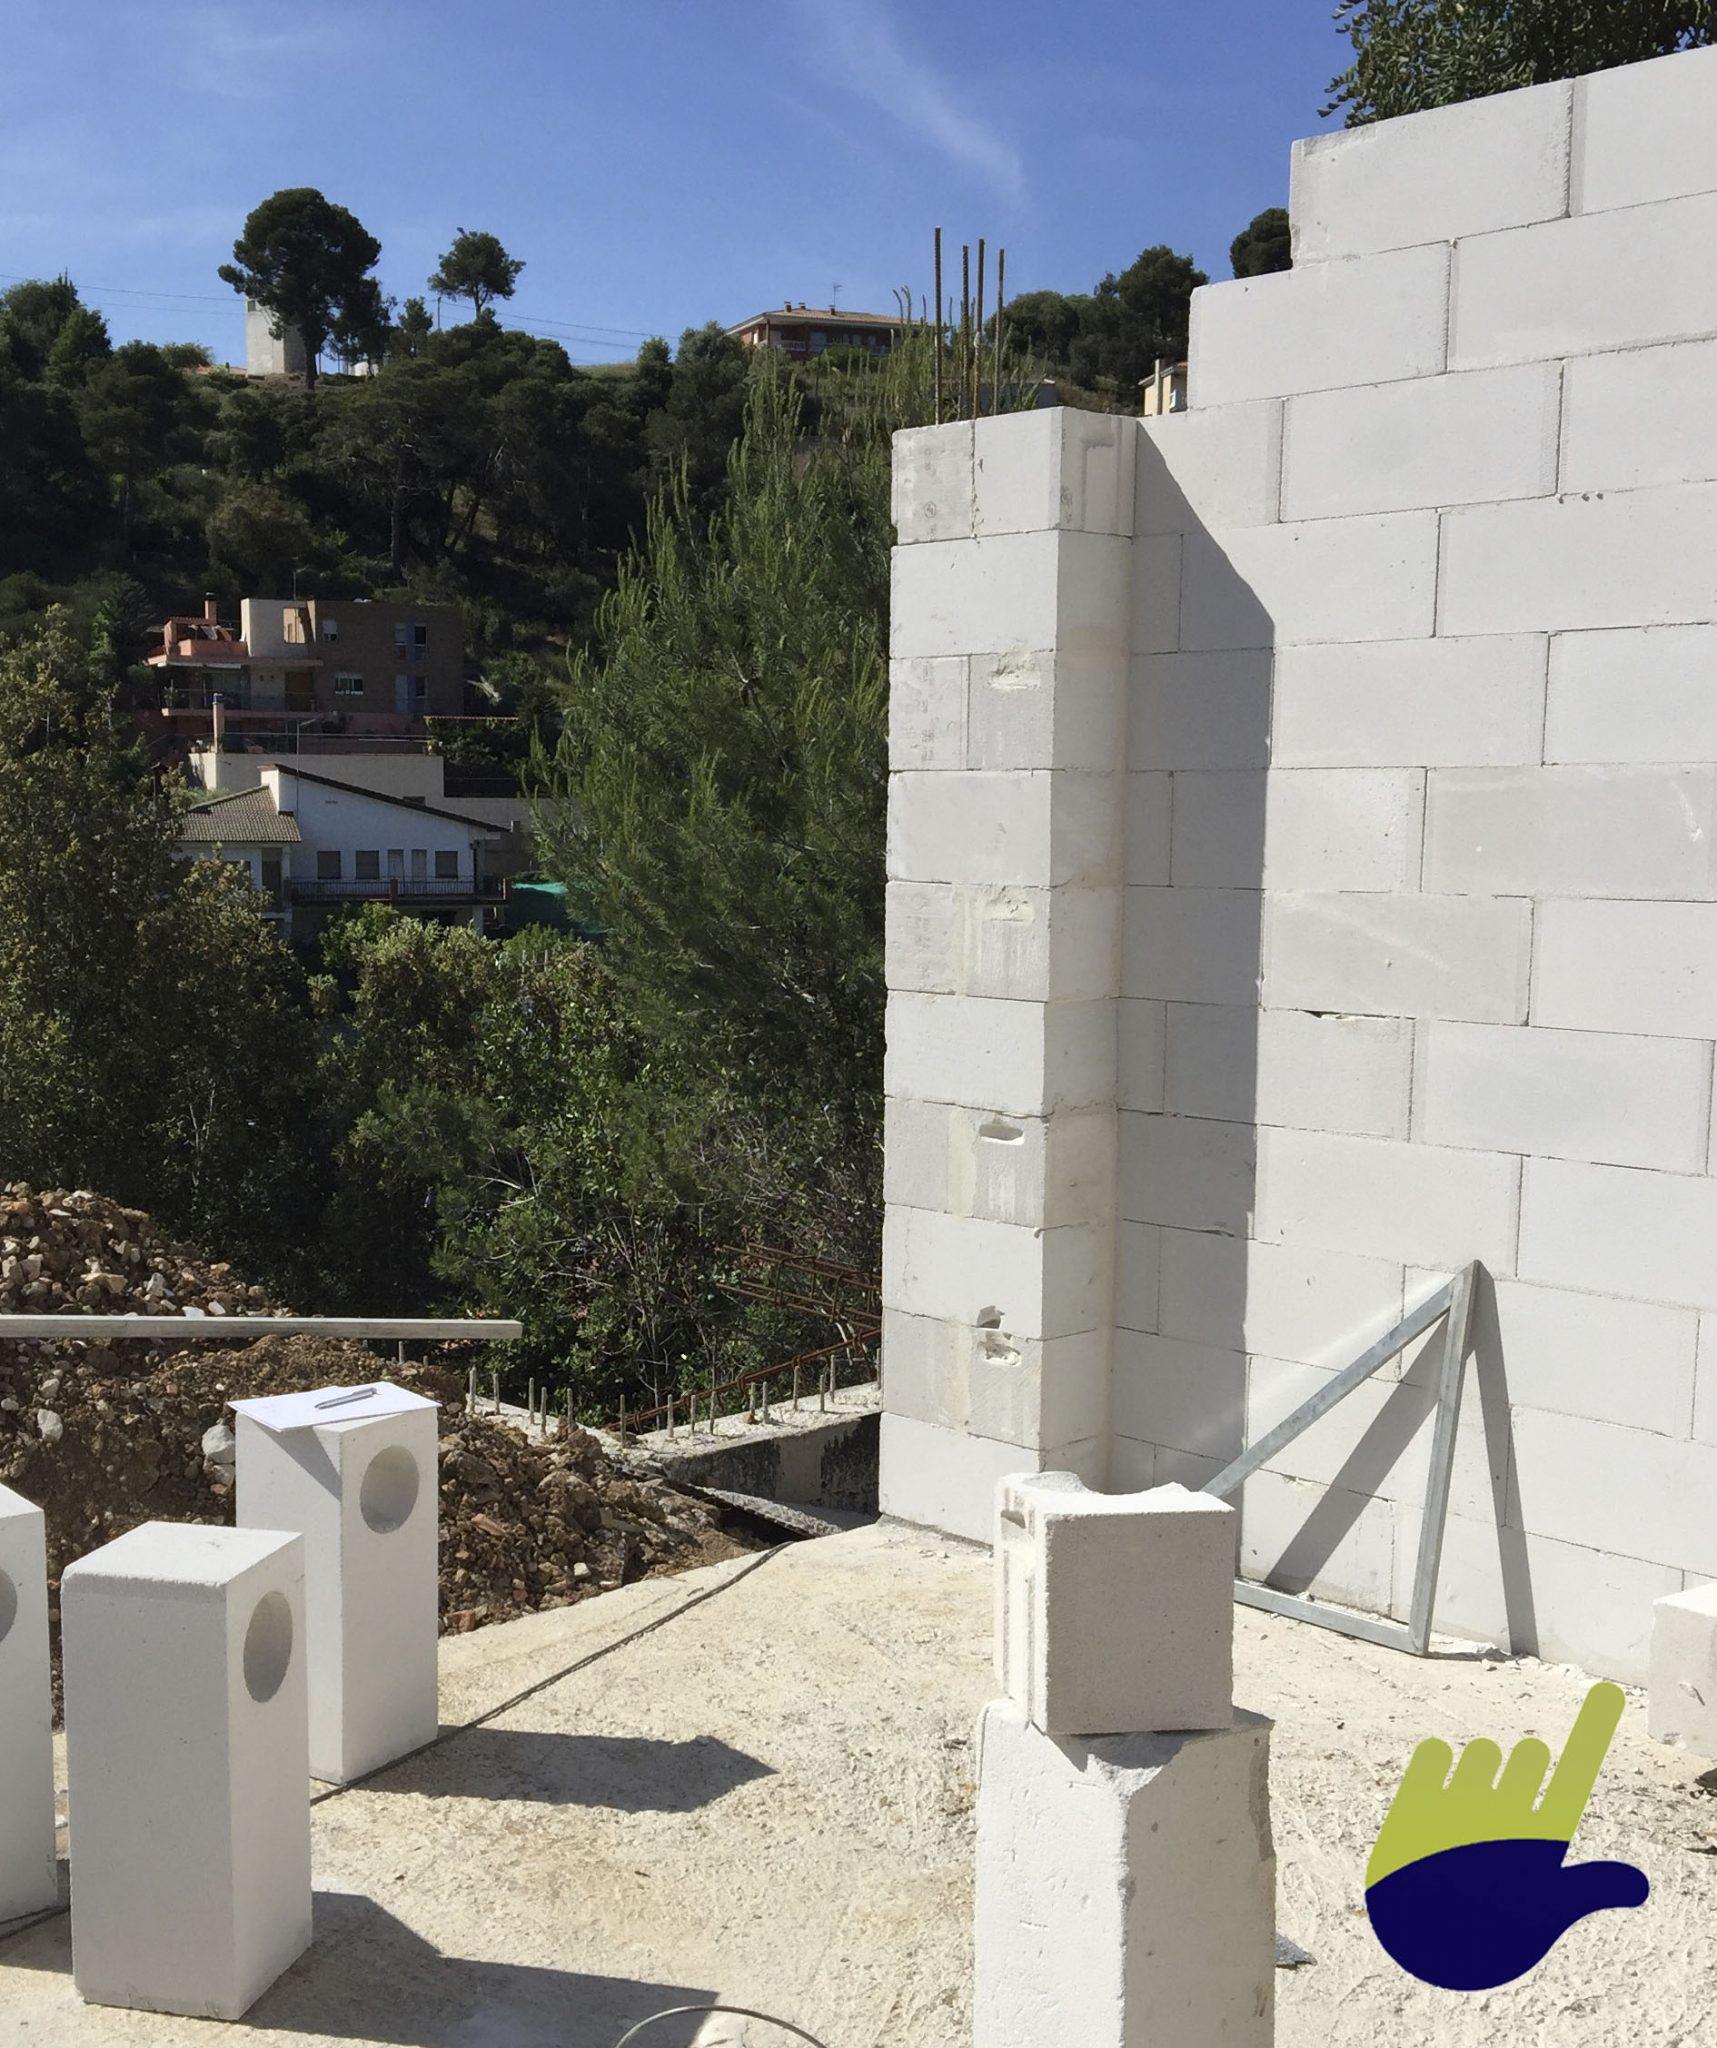 Casa hormigon celular maresme 98 construimos tu casa - Casas hormigon celular ...